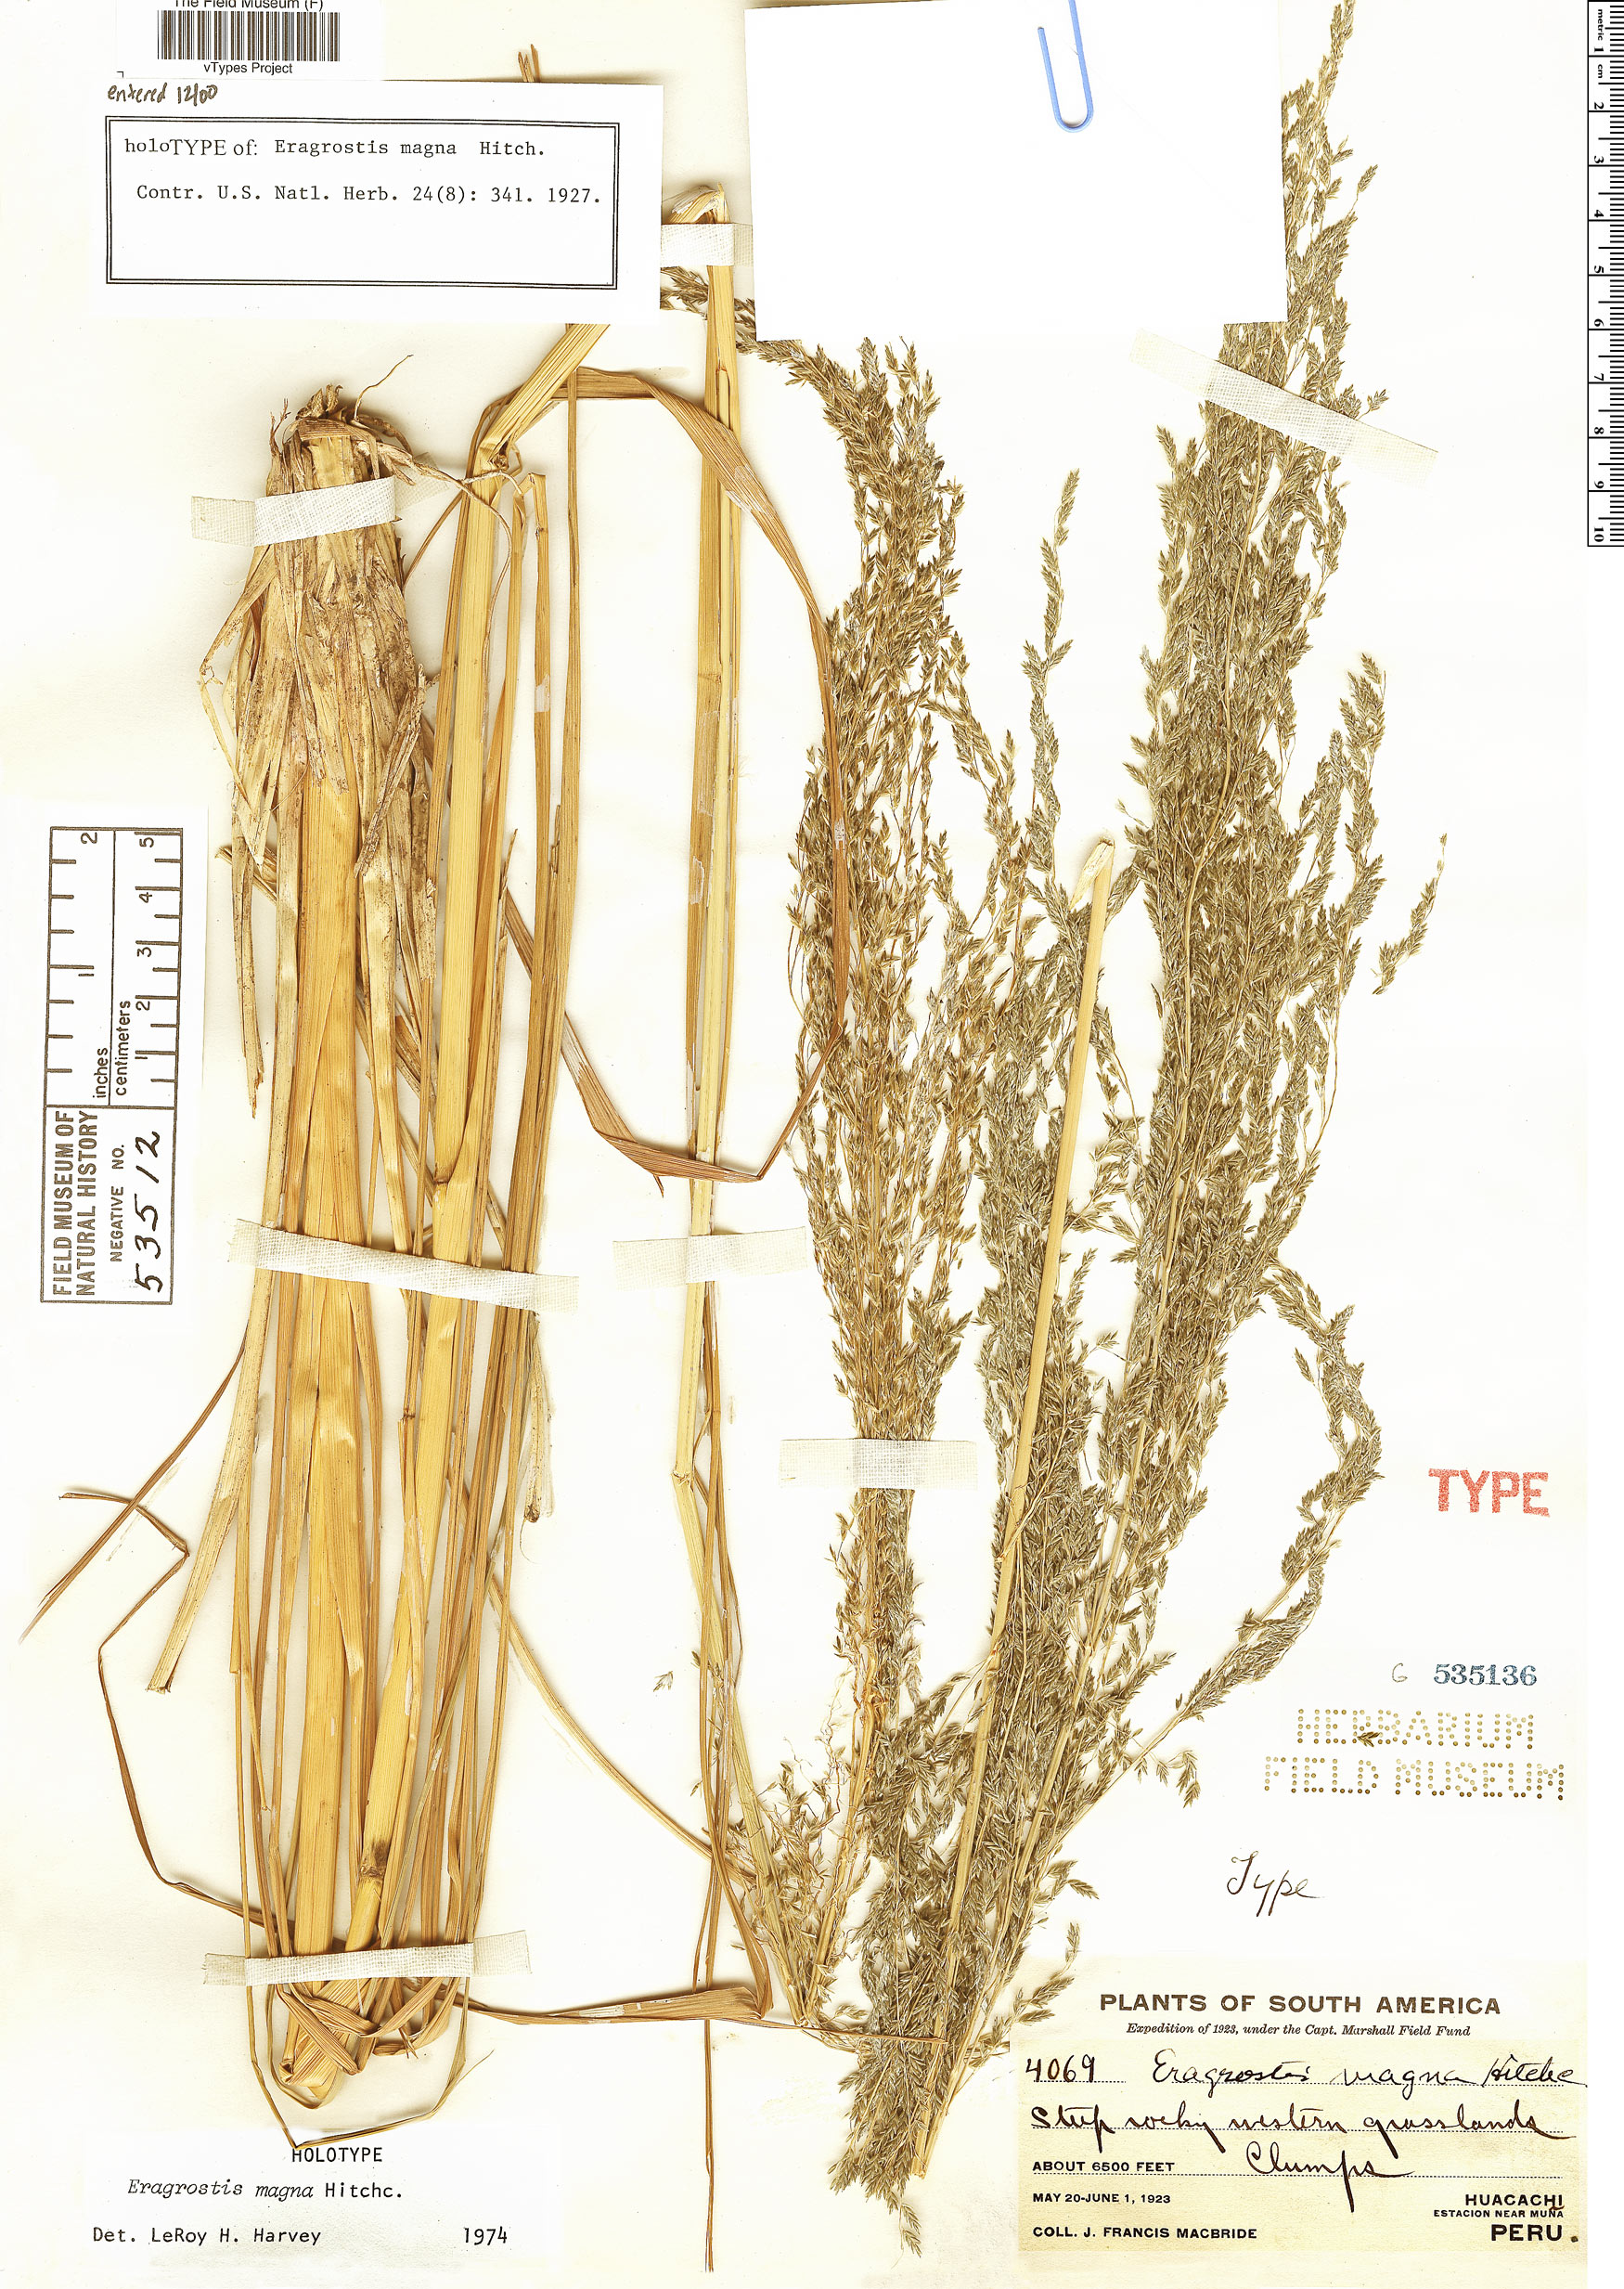 Specimen: Eragrostis magna